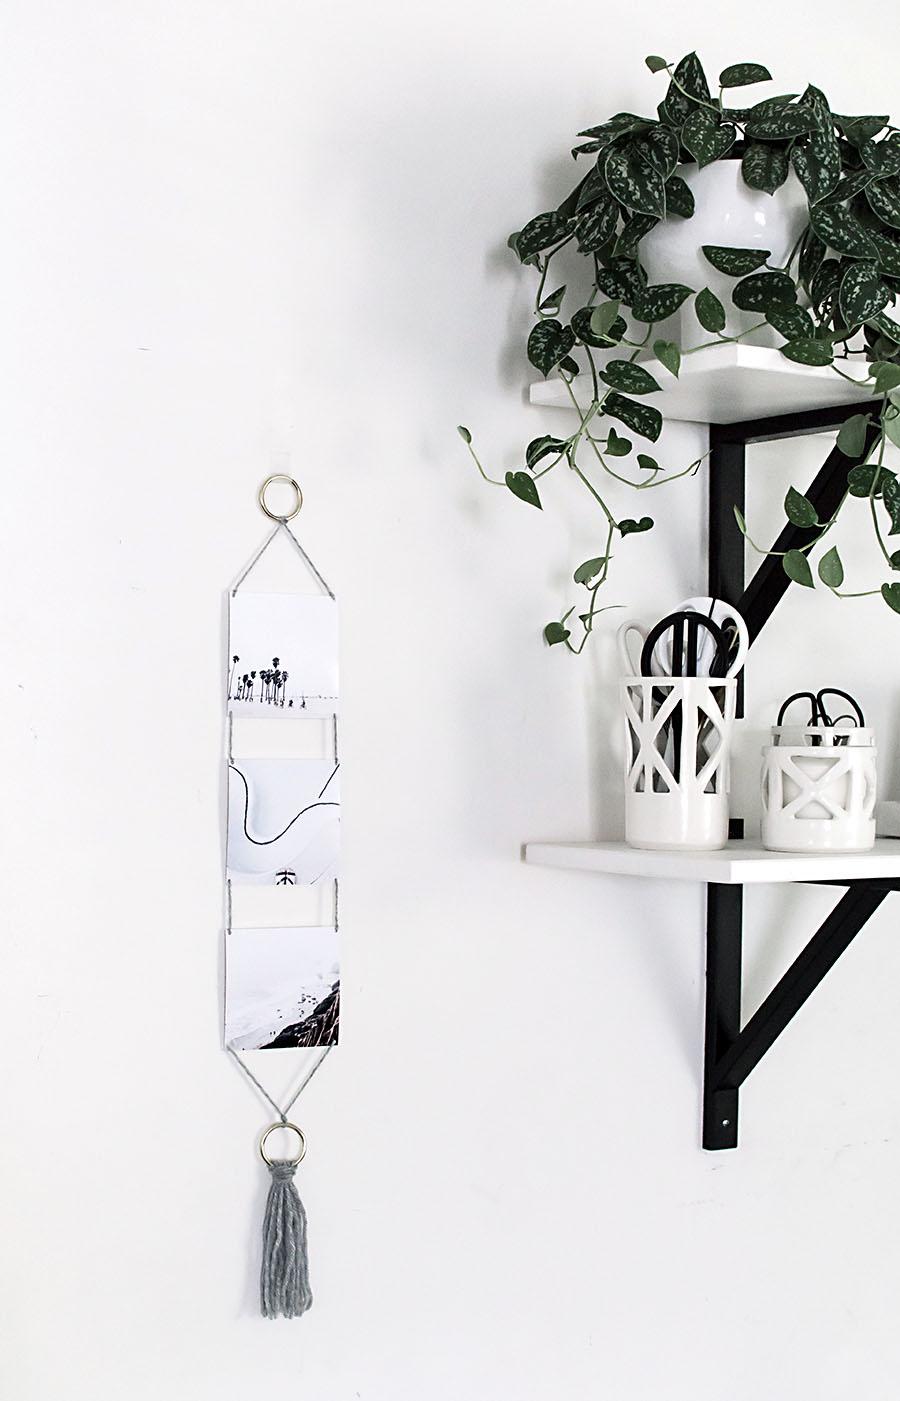 DIY - Modern Photo Wall Hanging